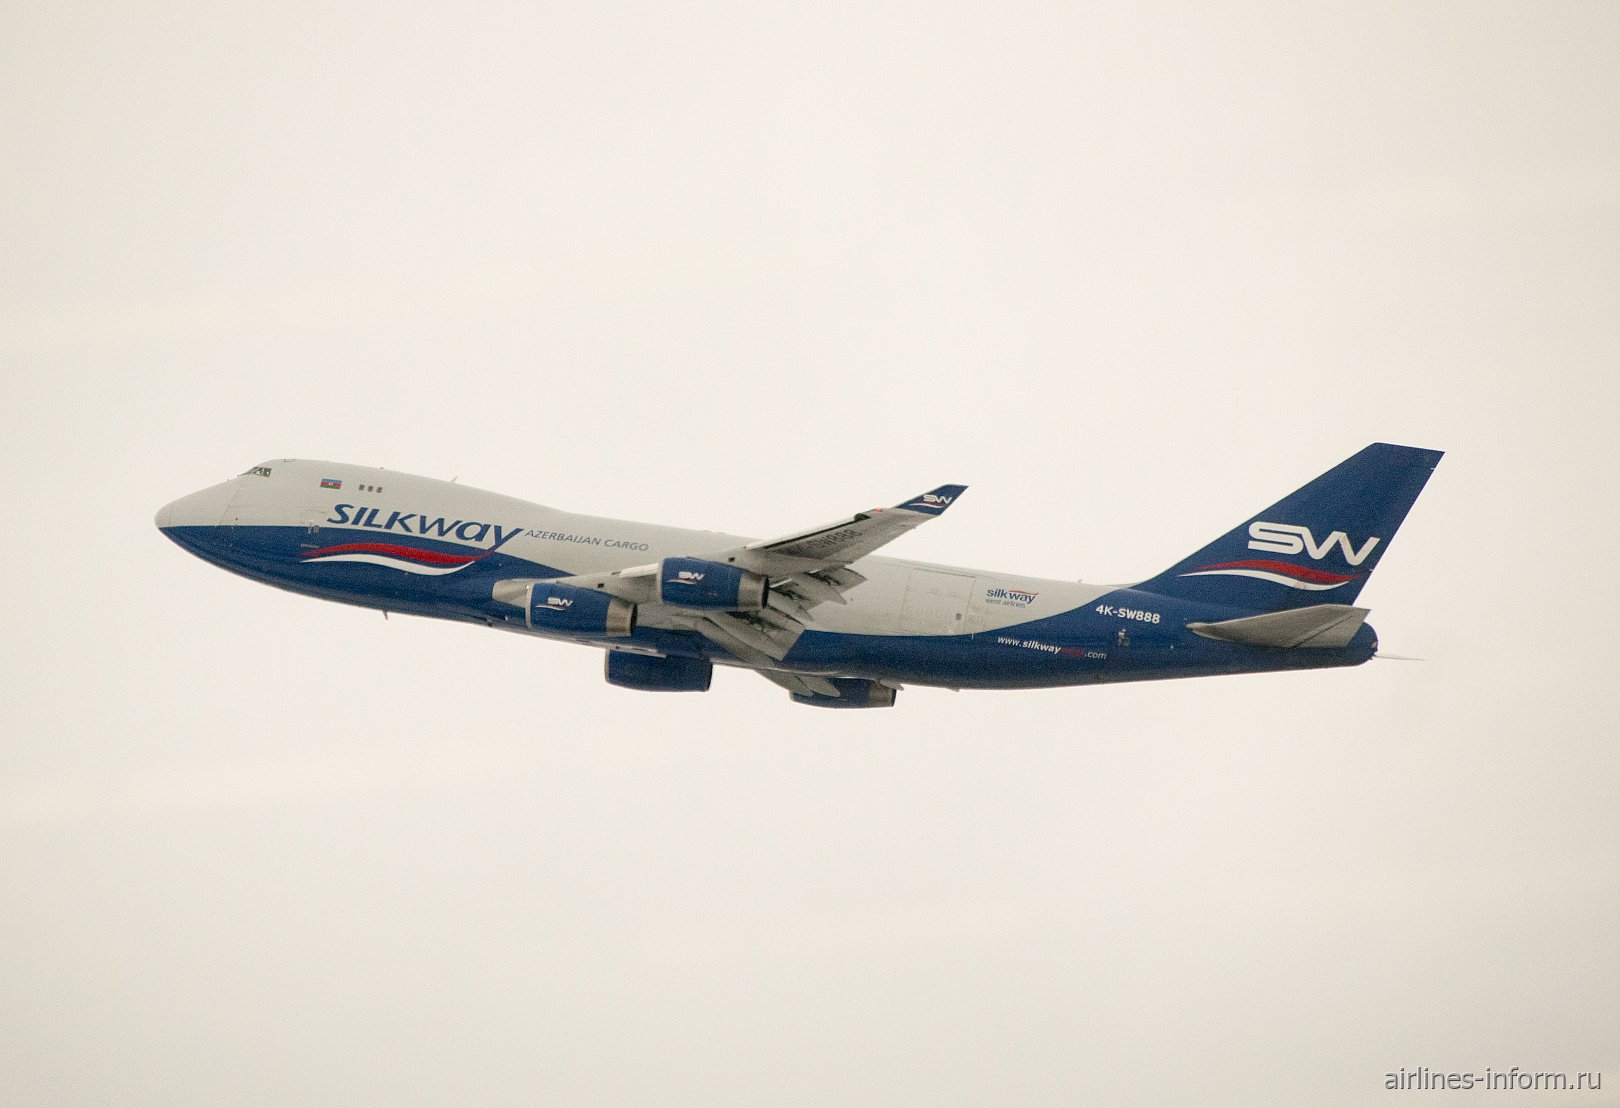 Взлет самолета Boeing 747-400F авиакомпании Silkway